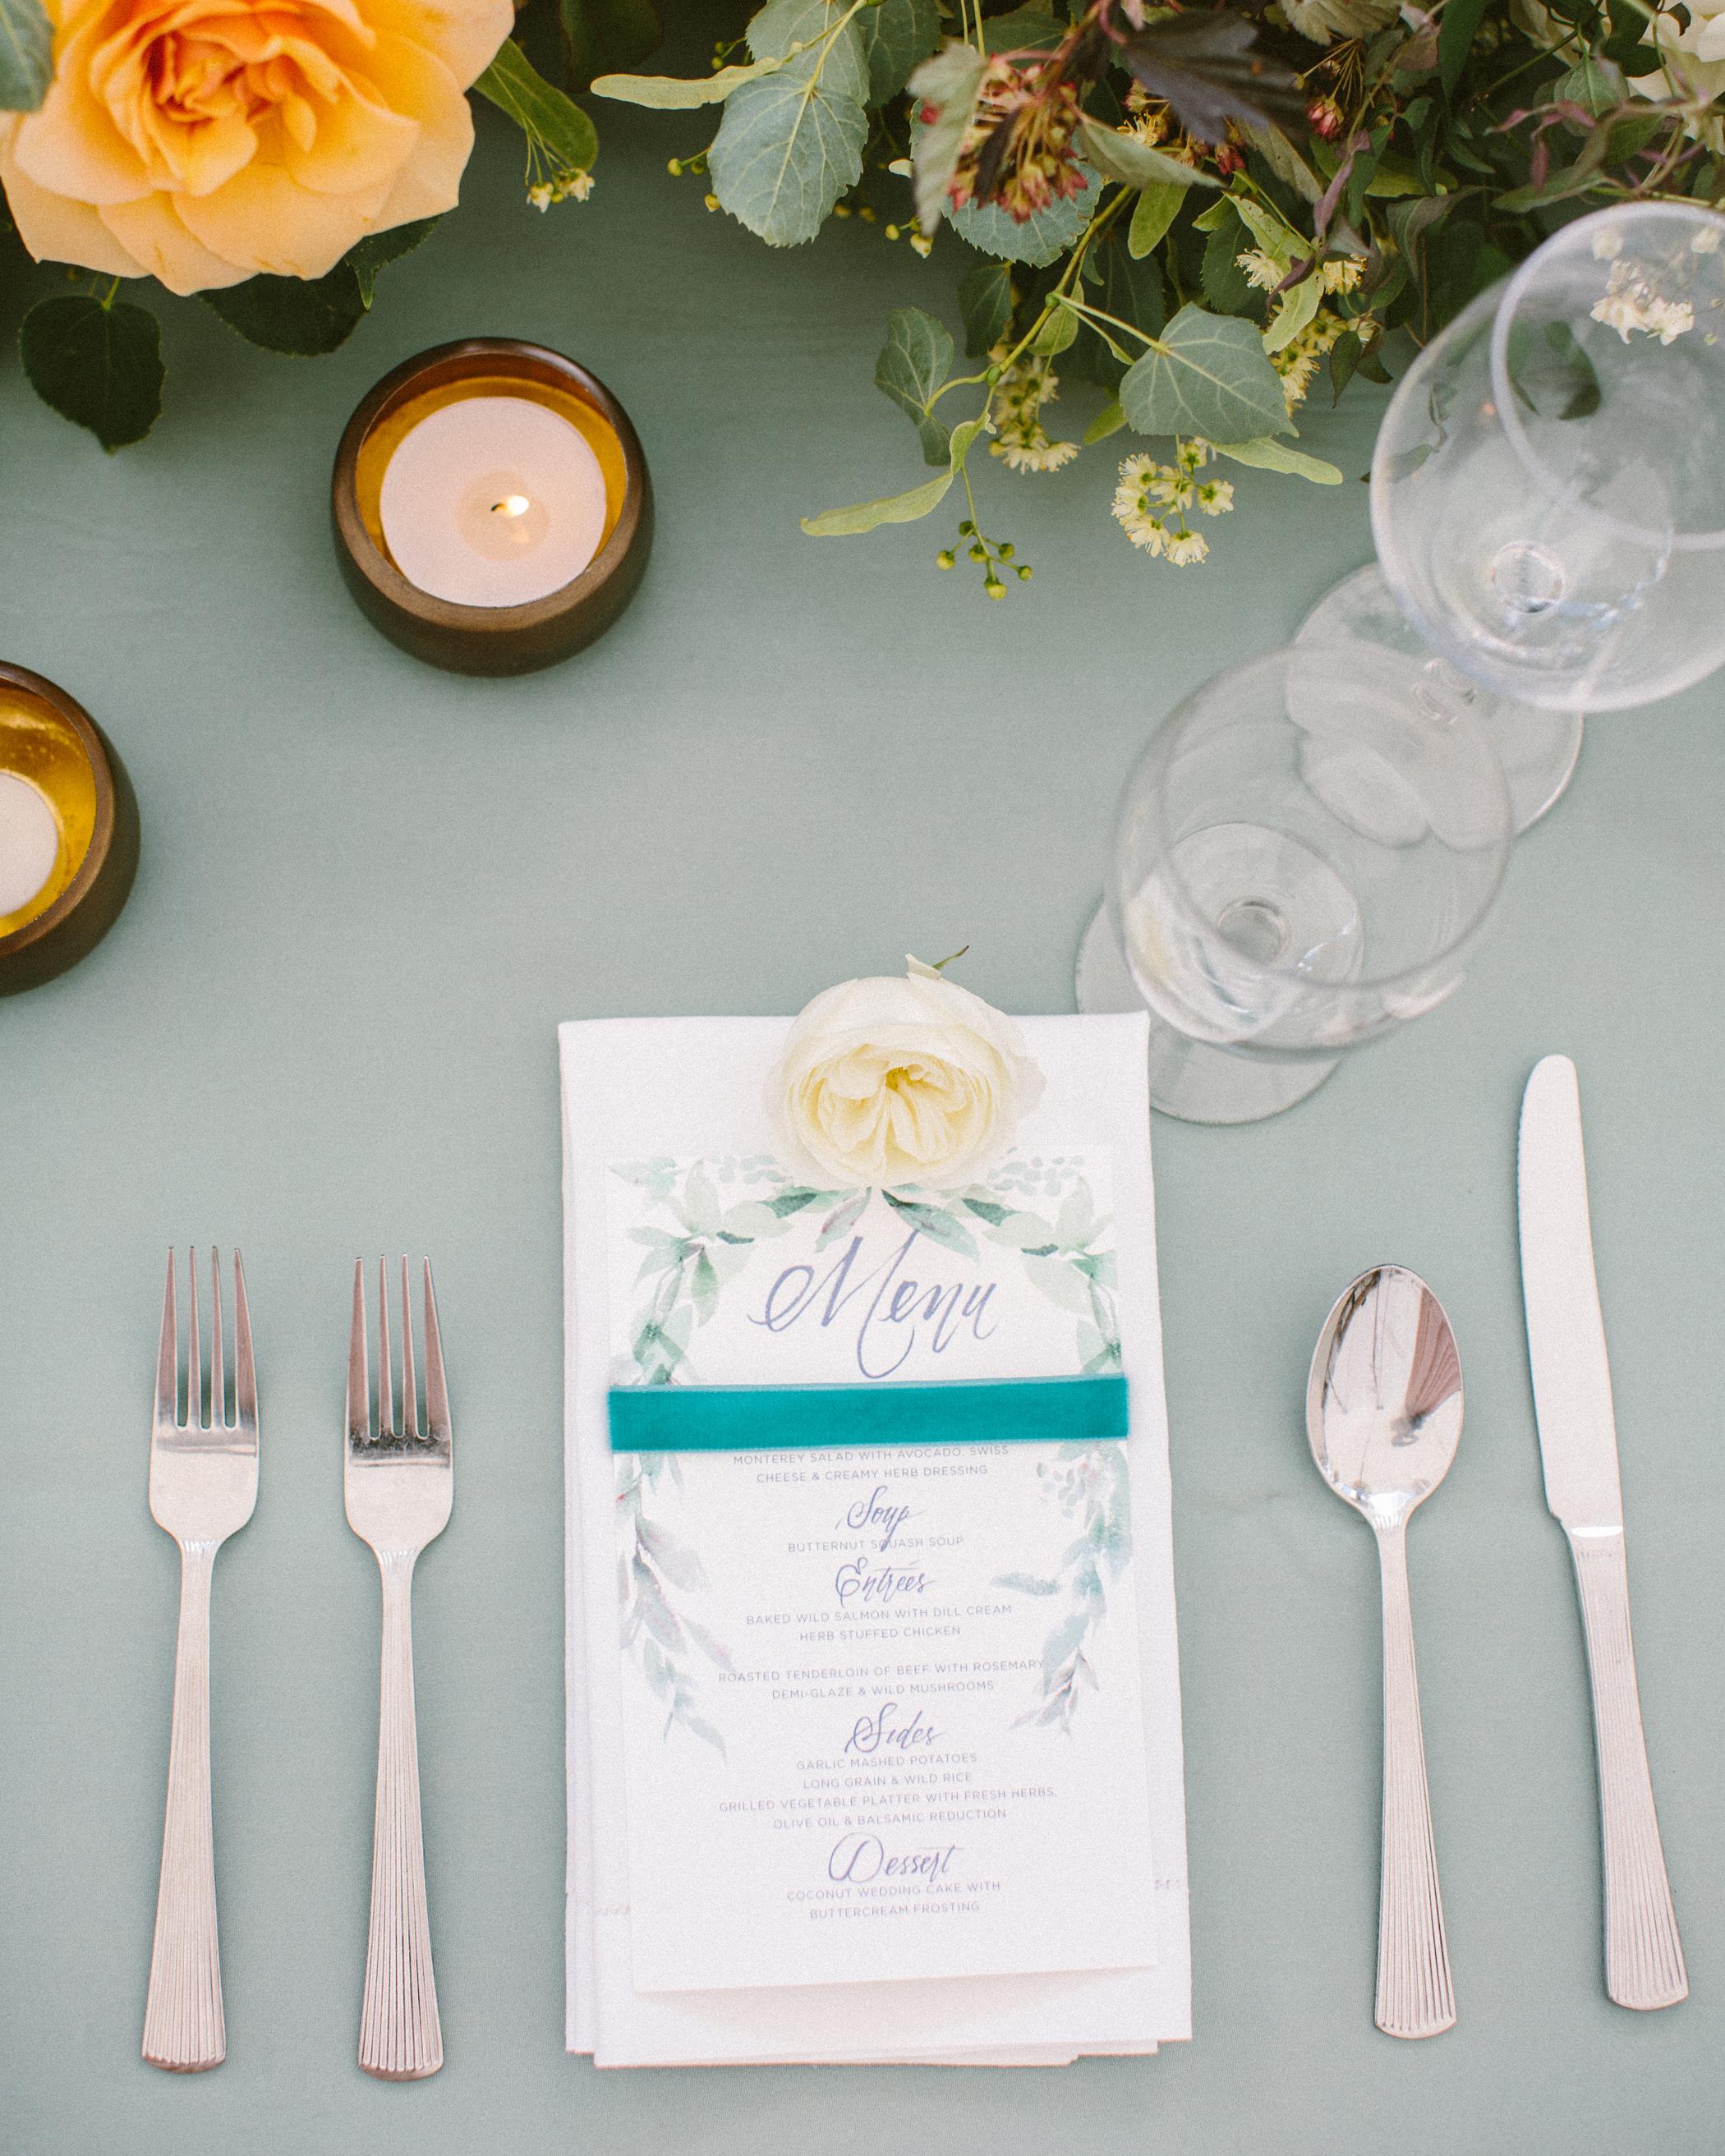 jamie-alex-wedding-placesetting-150-s111544-1014.jpg